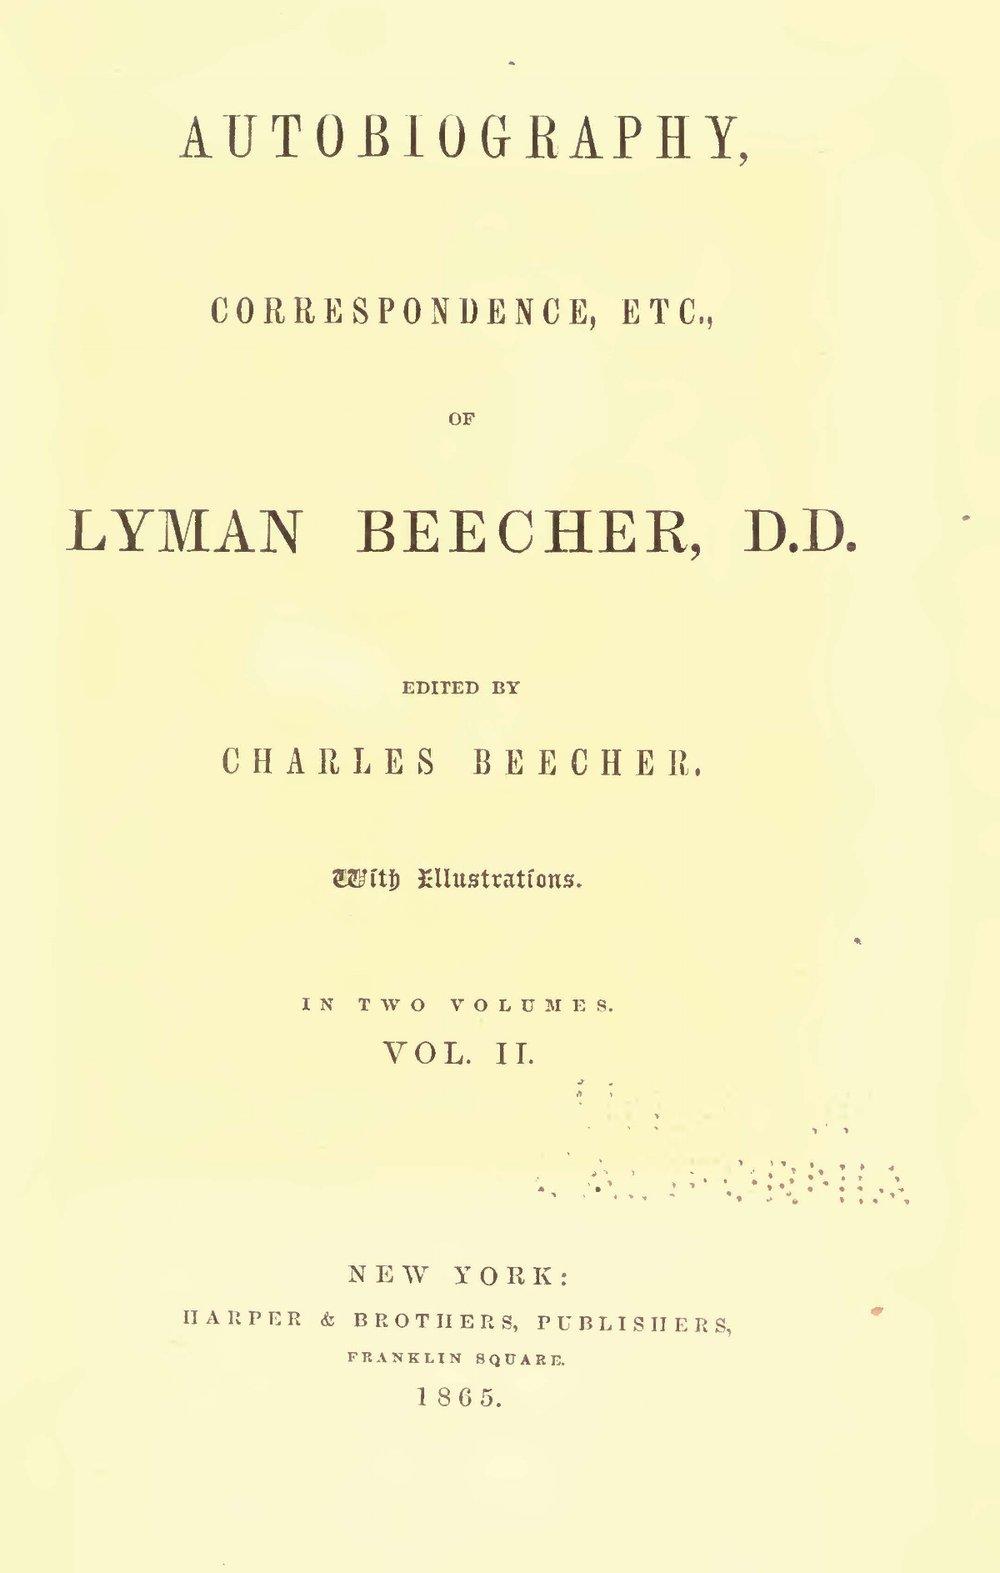 Beecher, Lyman, Autobiography, Correspondence, Etc., of Lyman Beecher, D.D., Vol. 2 Title Page.jpg